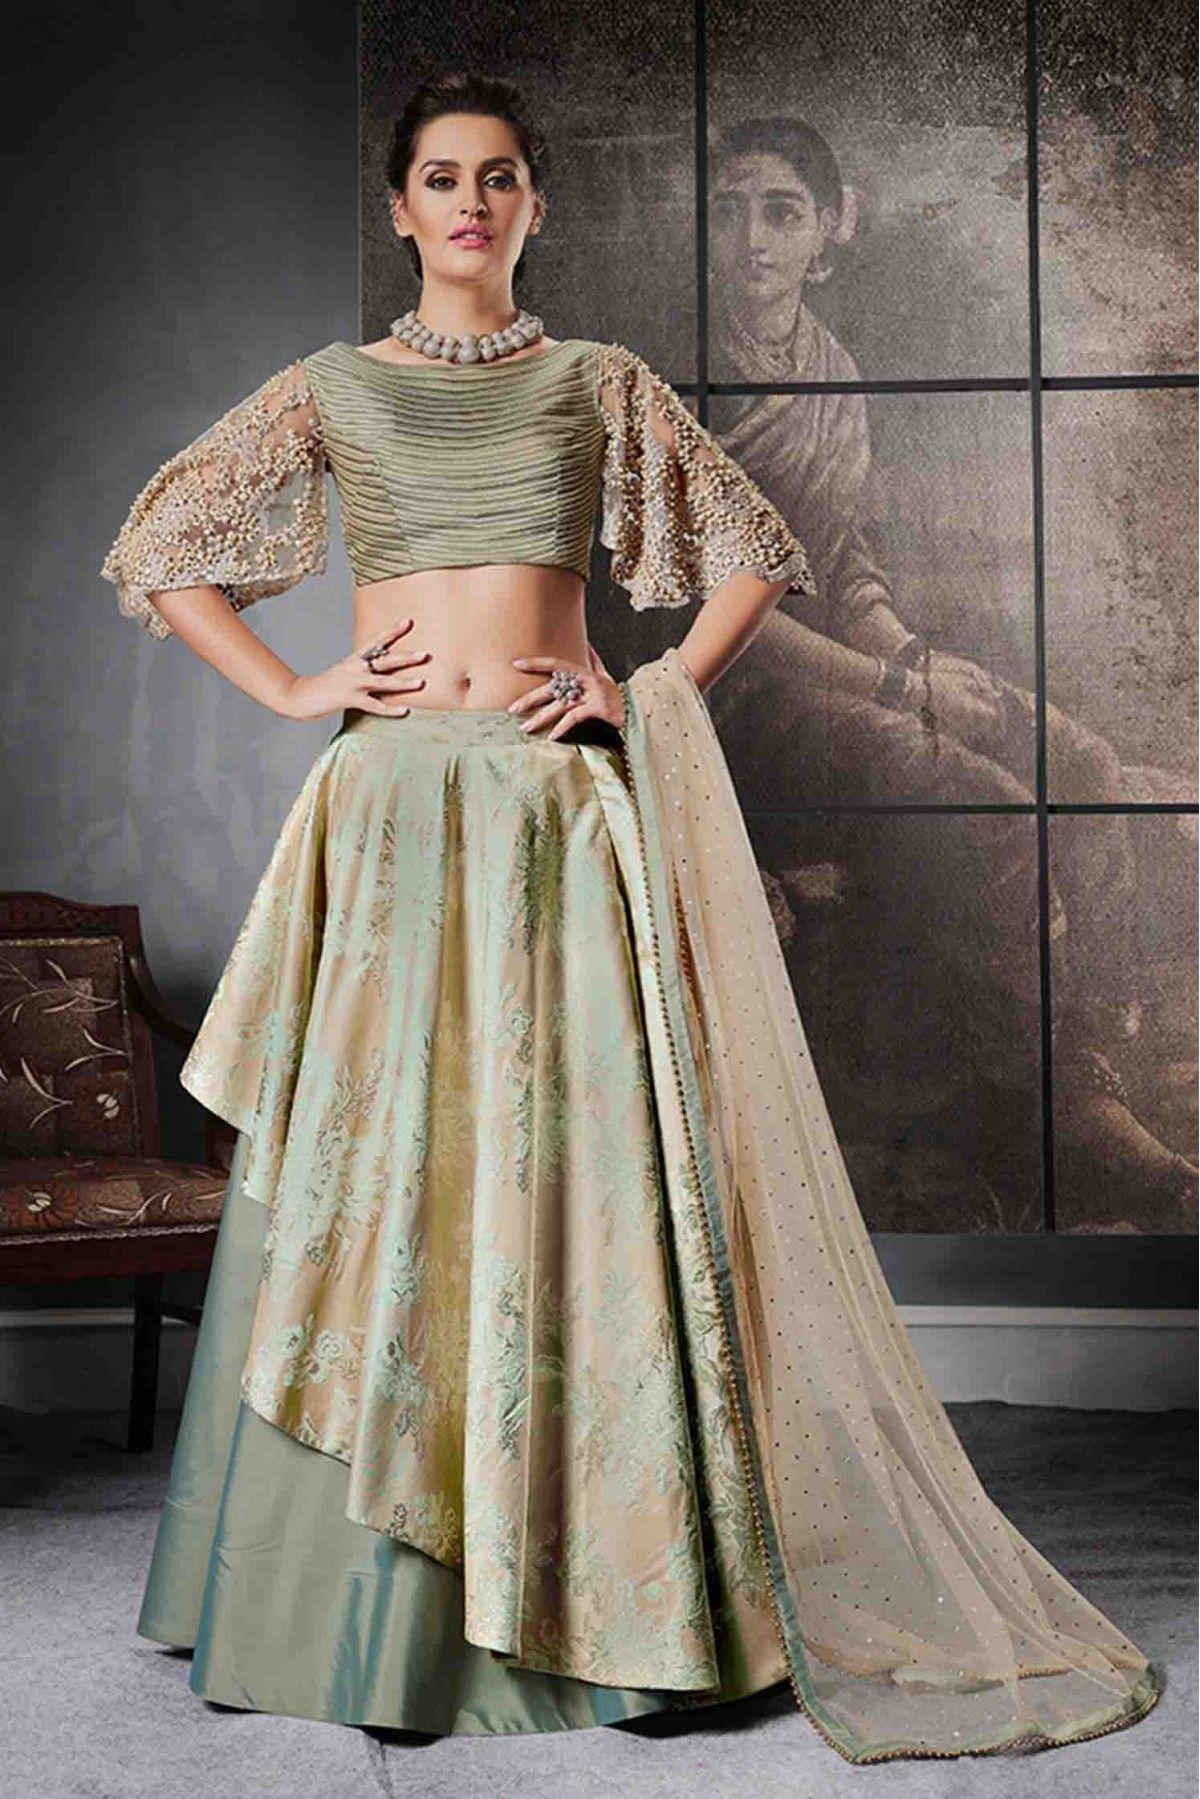 a6ec30278a Peach and Grey Colour Jacquard Silk and Taffeta Lehenga Choli Comes With  Matching Raw Silk Blouse Fabric and Net Dupatta Fabric.